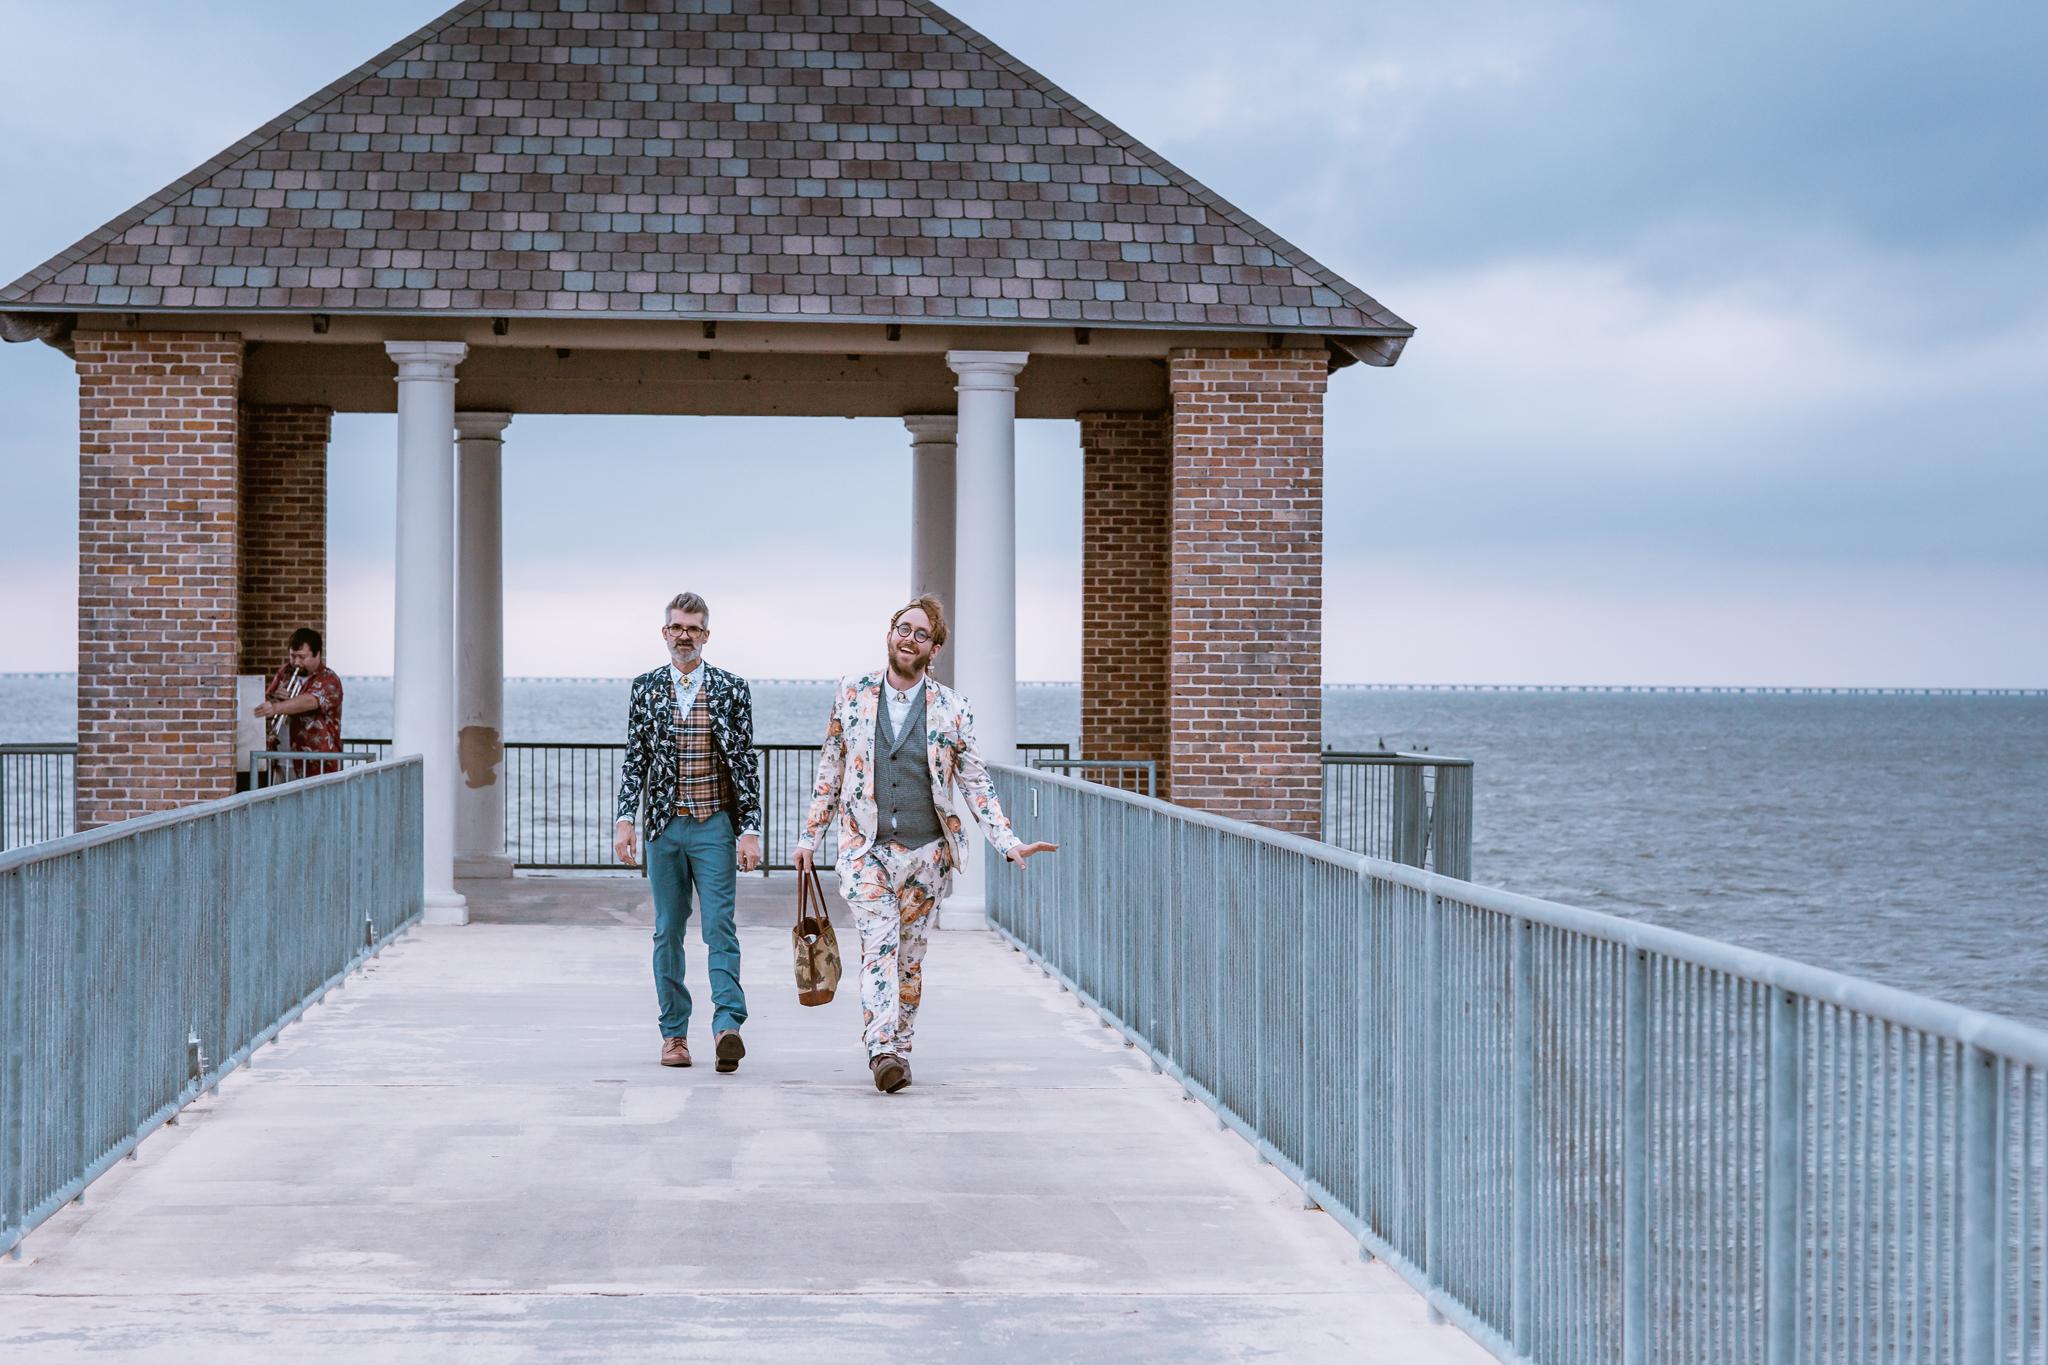 Tim and David - New orleans Wedding - Kallistia Photography-10.jpg